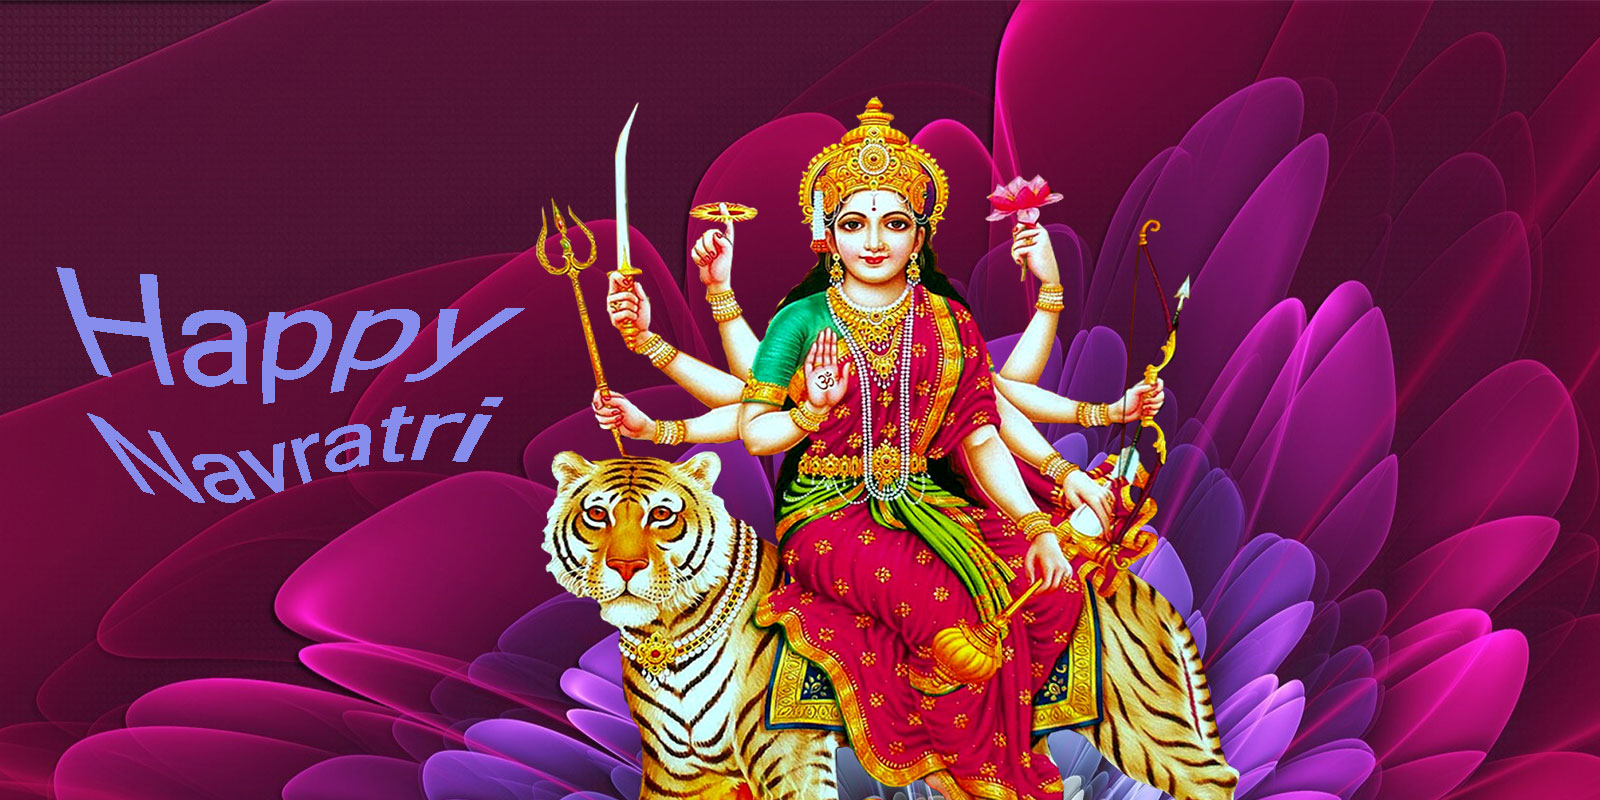 Hindu God Goddess Ganesh Durga Mata Wallpaper